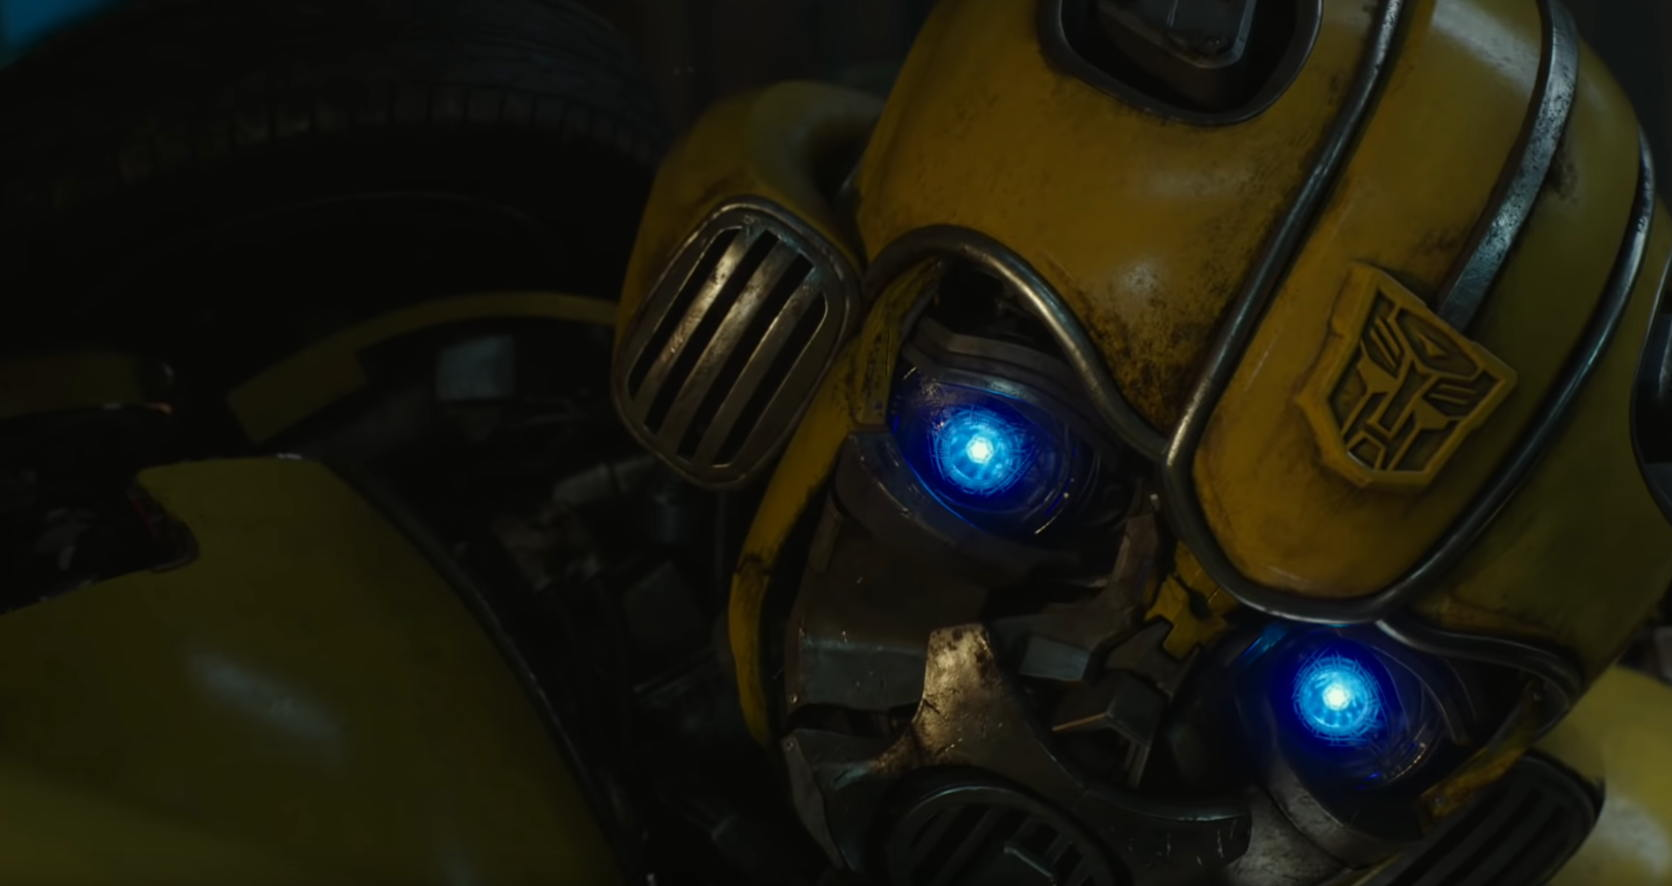 La bande-annonce du spin-off de Transformers — BUMBLEBEE